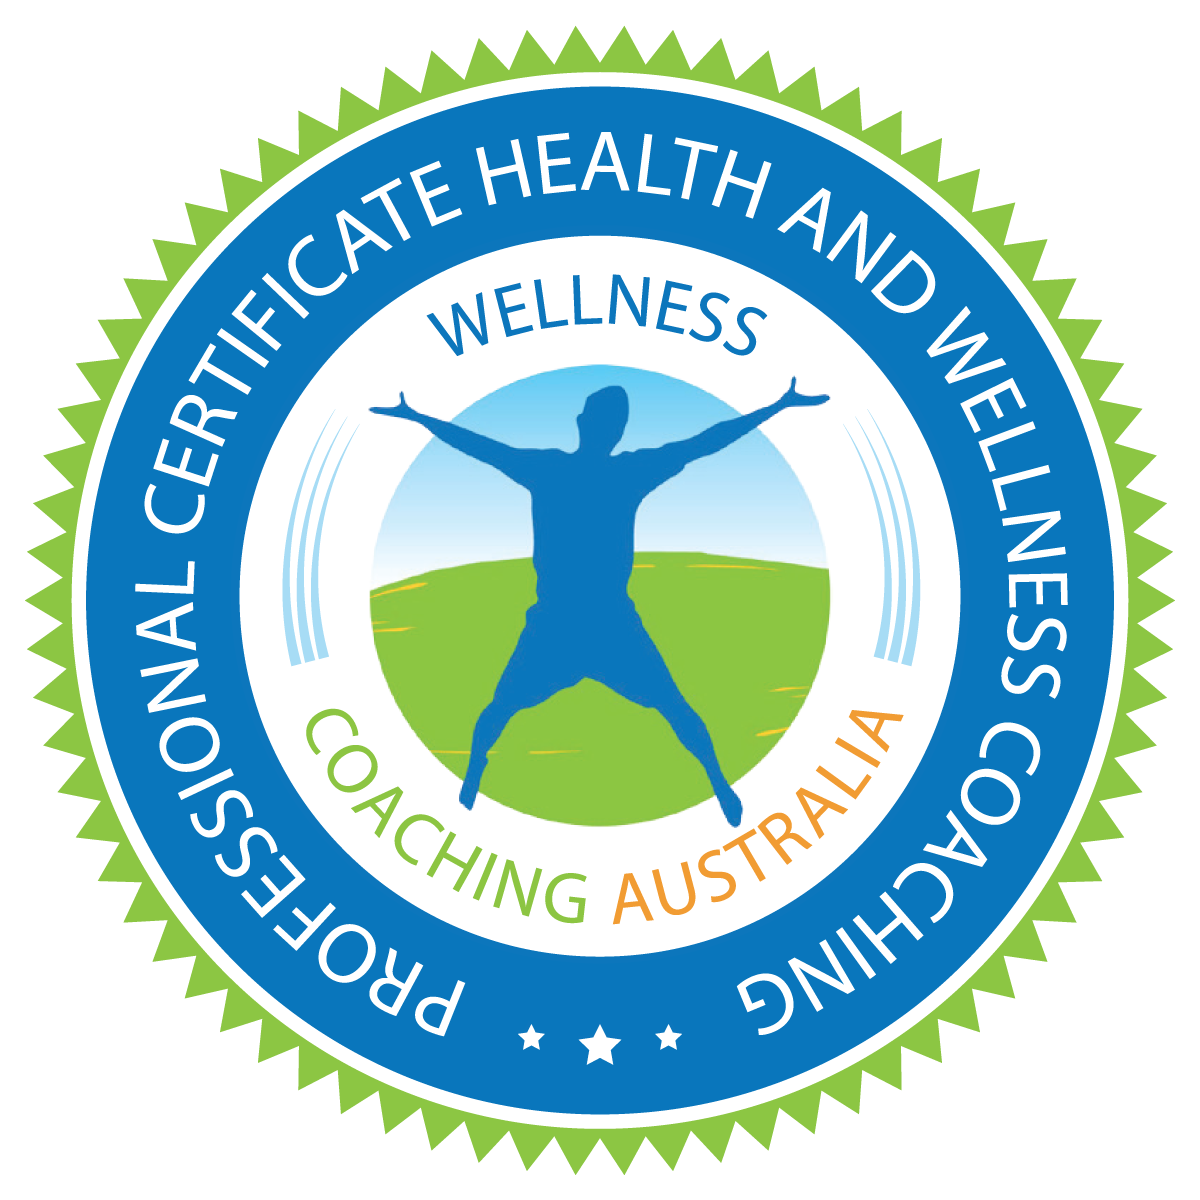 Professional Certificate Health and Wellness Coaching Australia